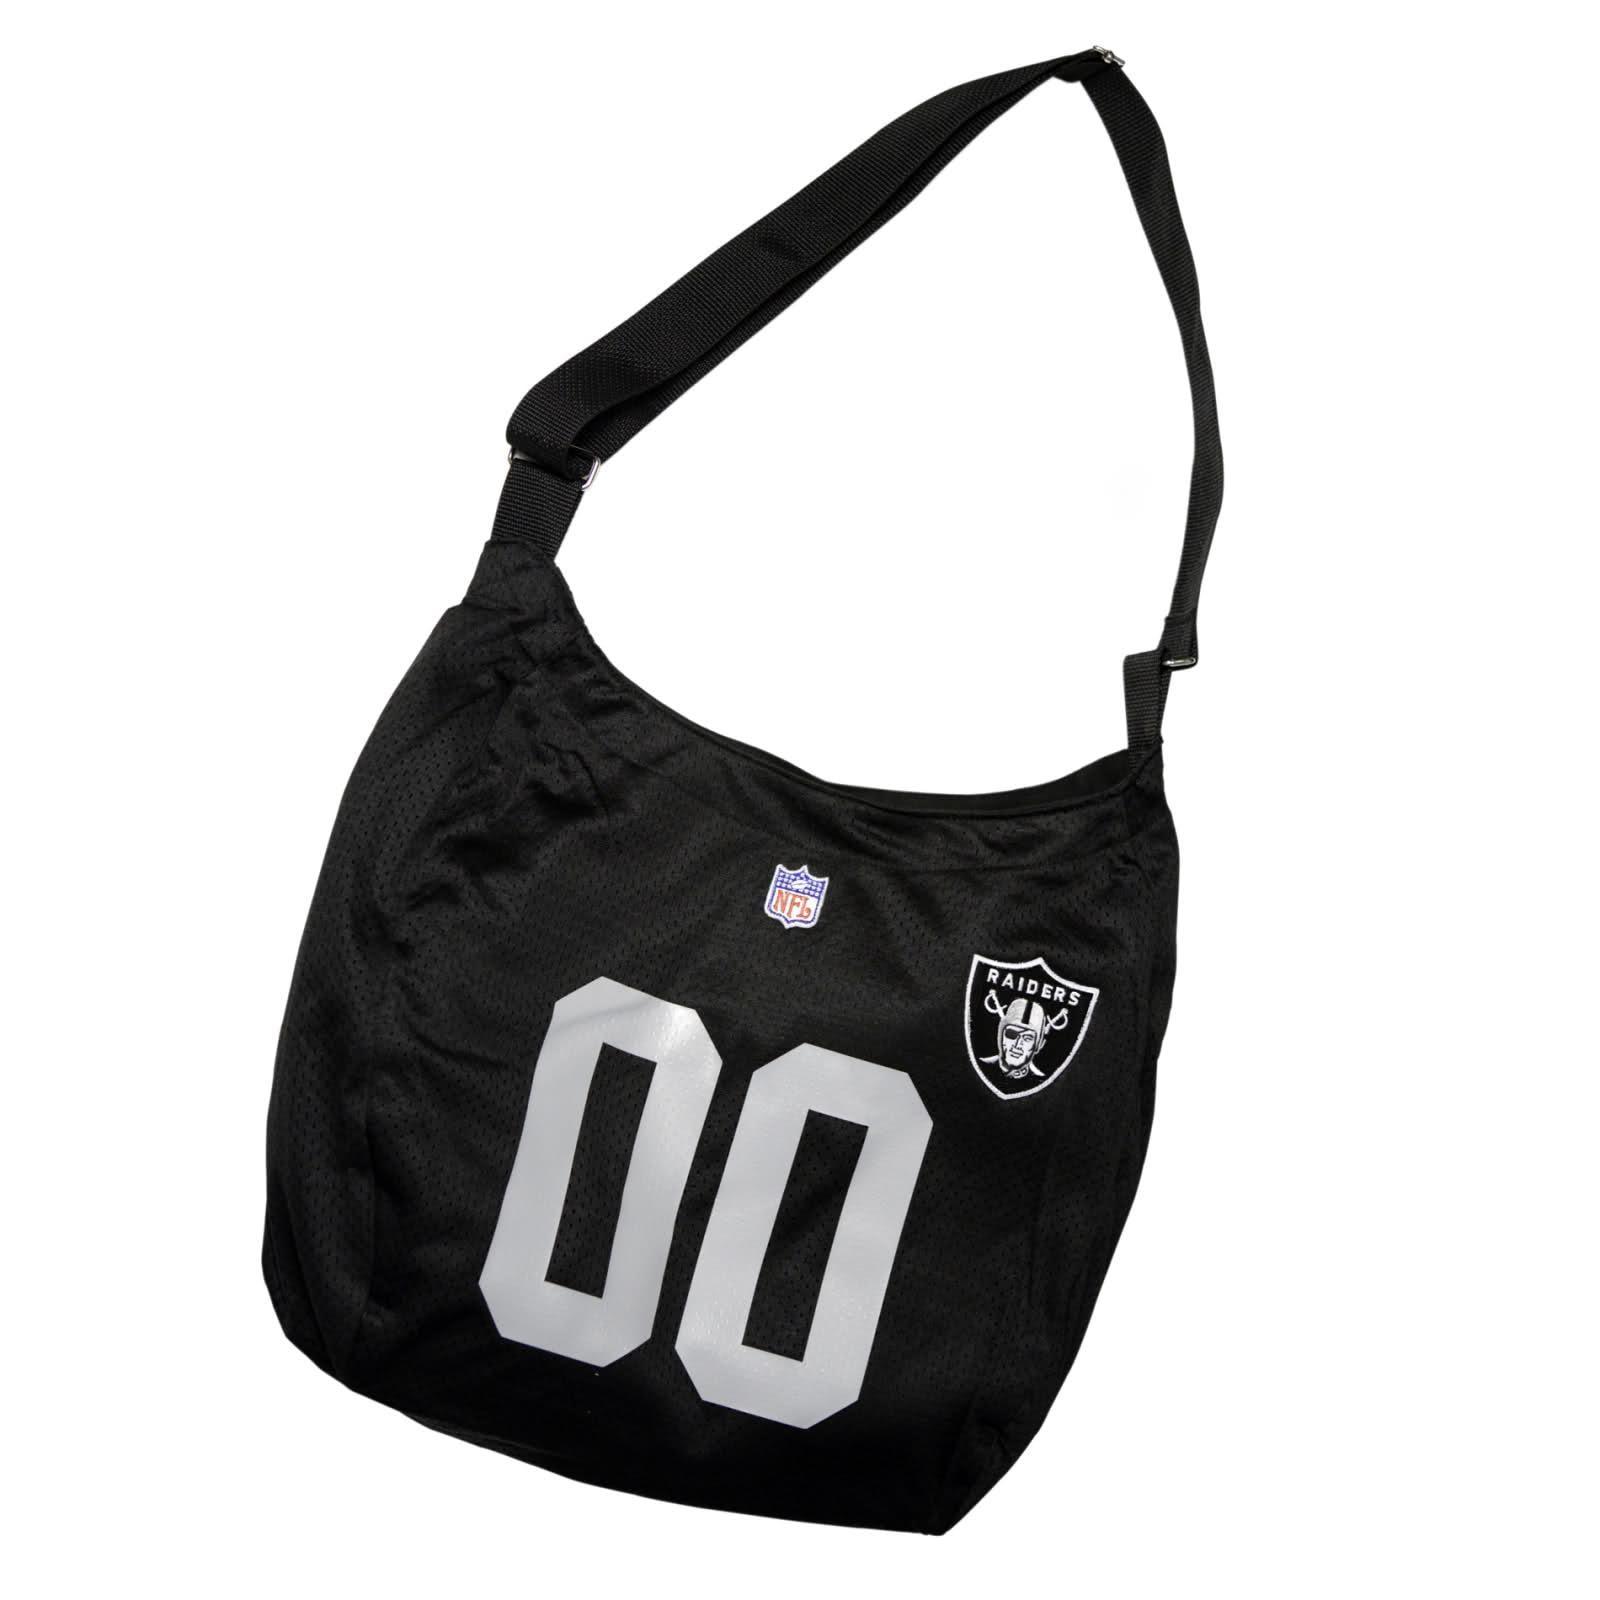 Little Earth Oakland Raiders Veteran Jersey Tote Bag